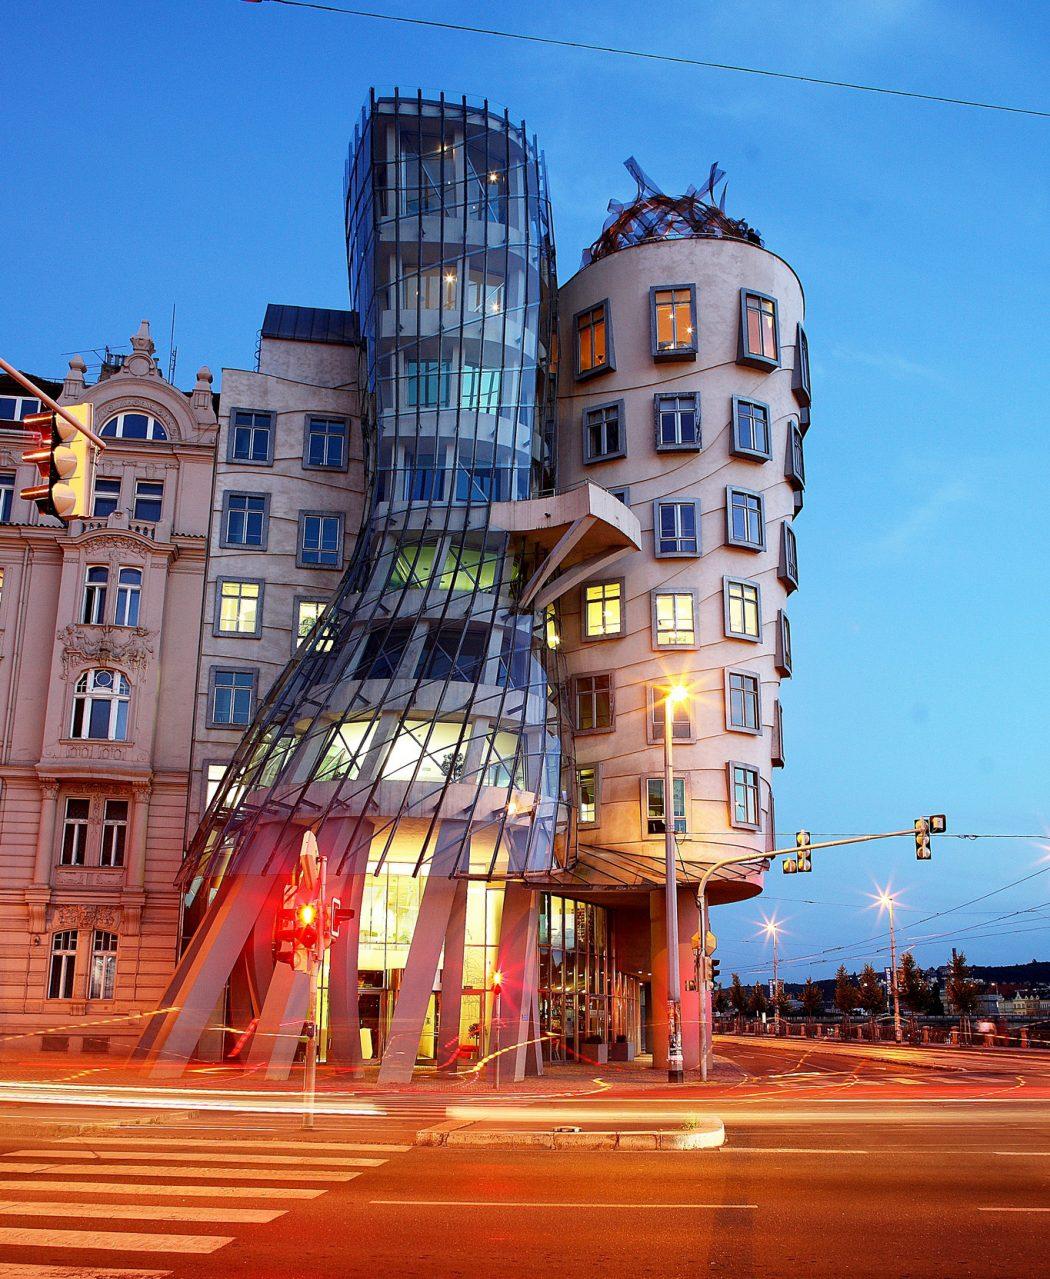 Case_danzanti Top 10 Most Beautiful Buildings in the World in 2015